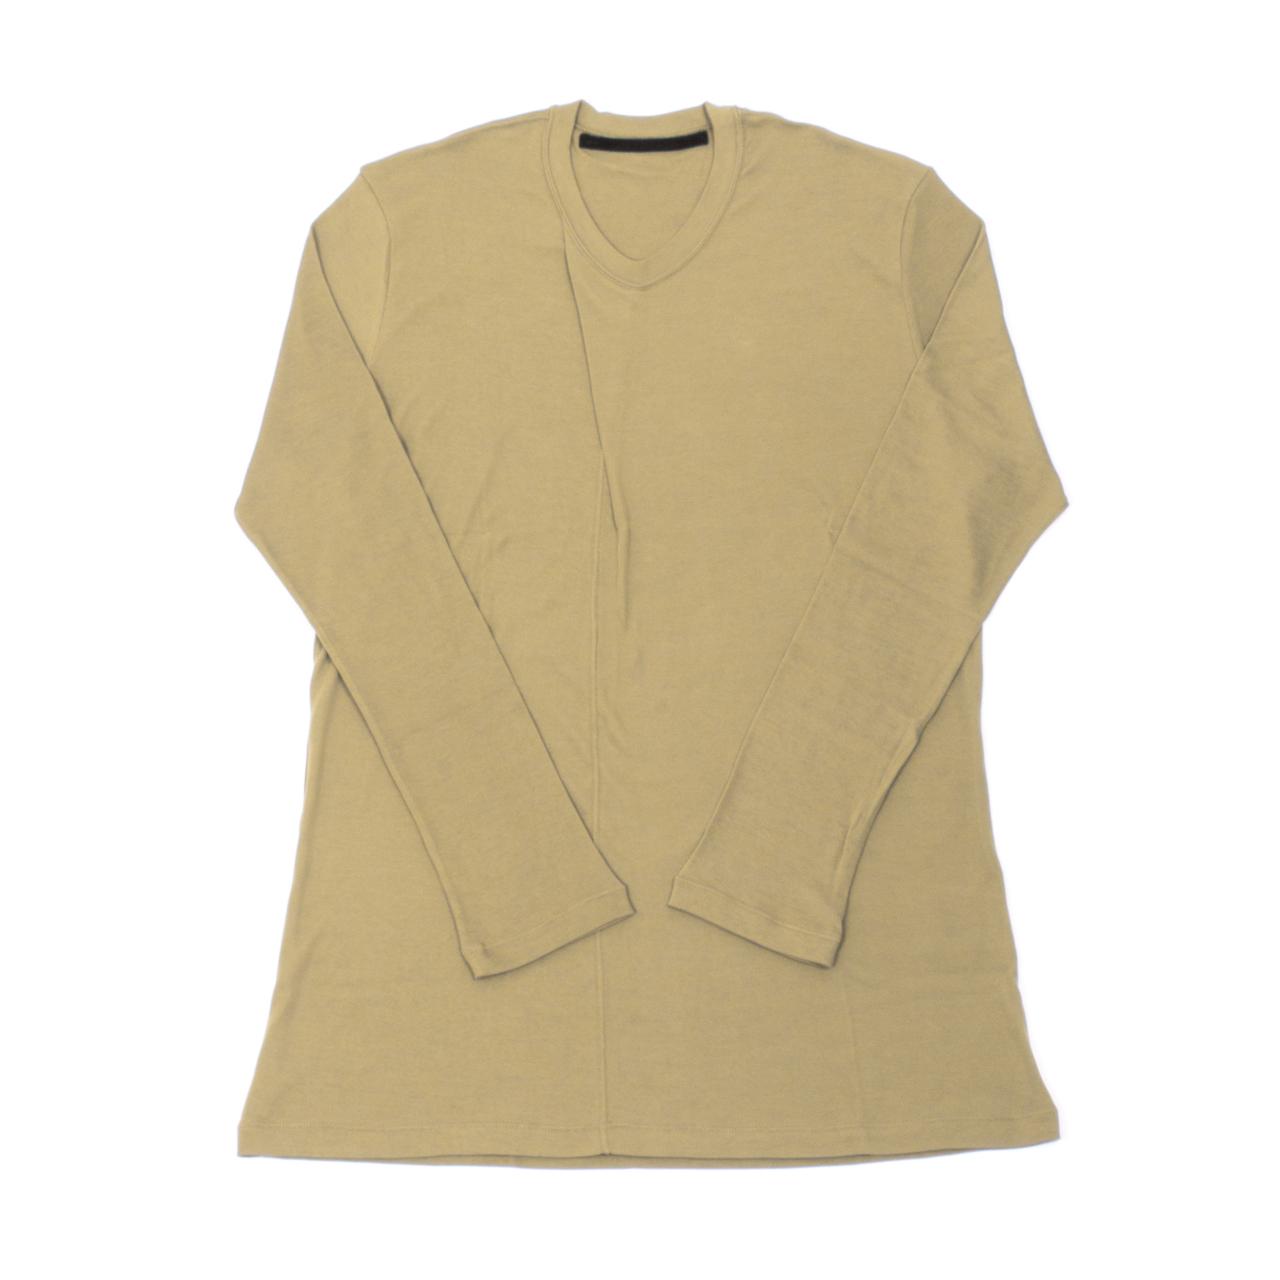 707CUM5-SAND / カラータック ロングスリーブ Tシャツ